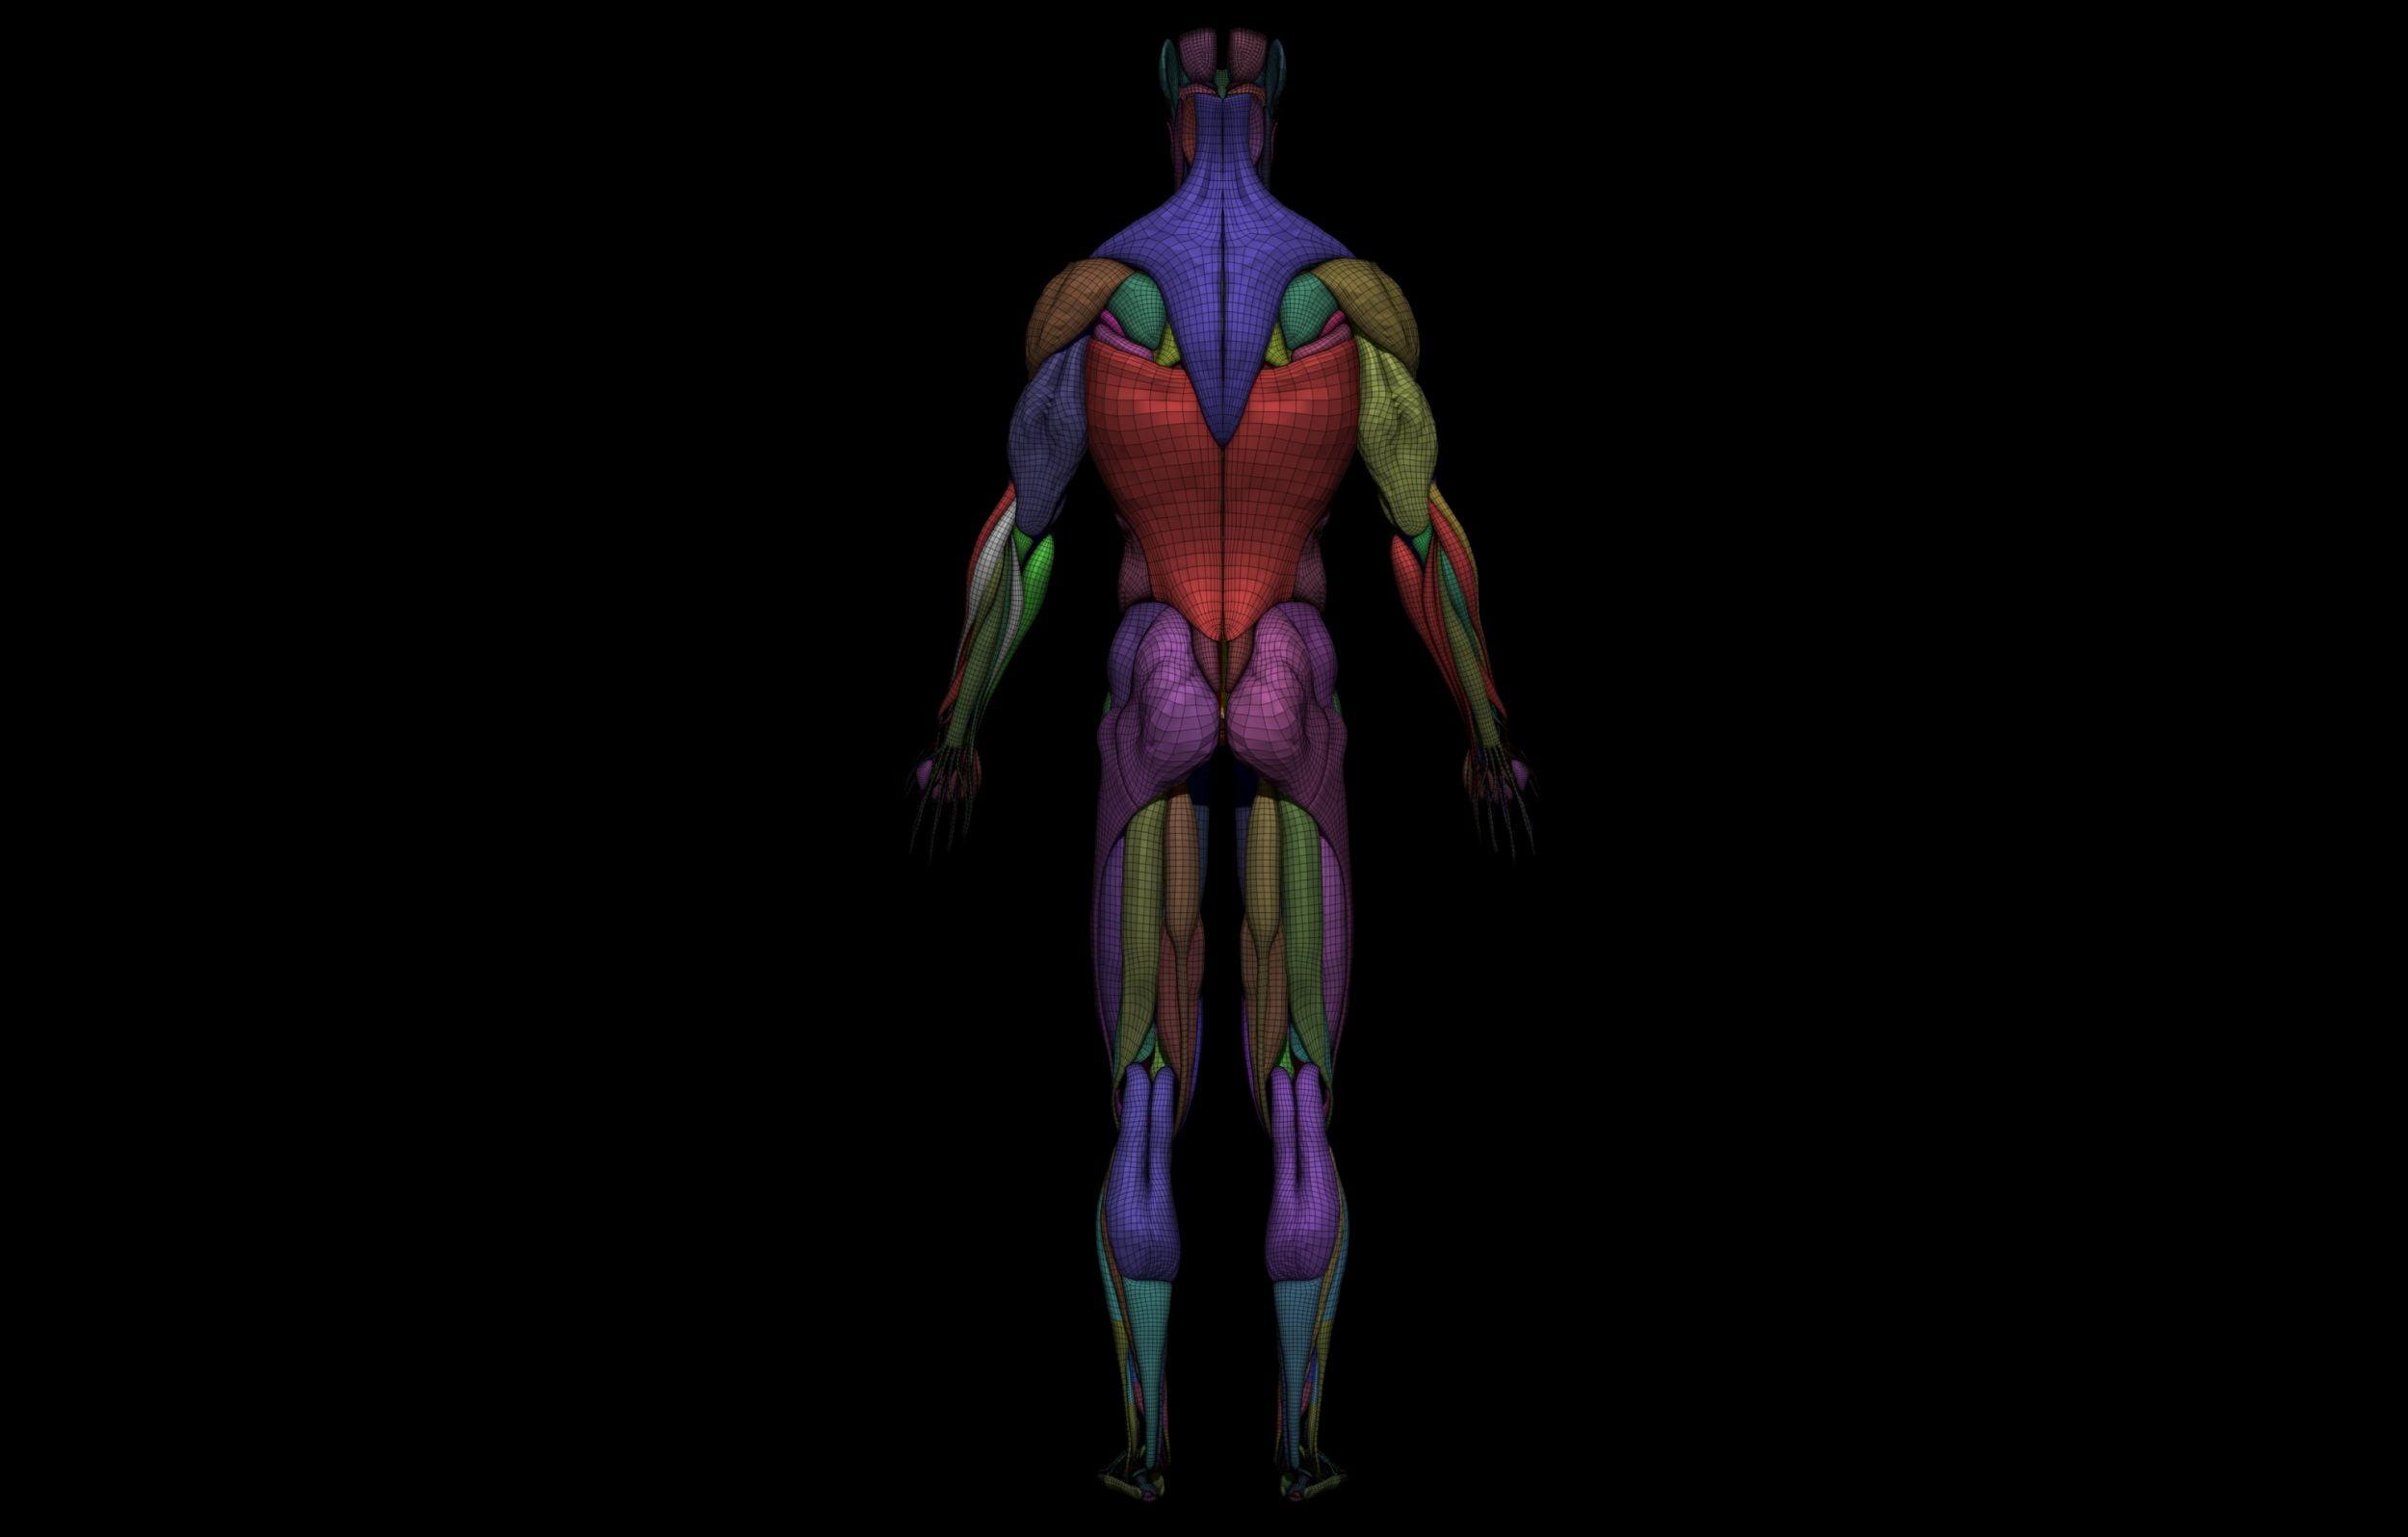 14 2 scaled SA Anatomy   Study Anatomy in 3D